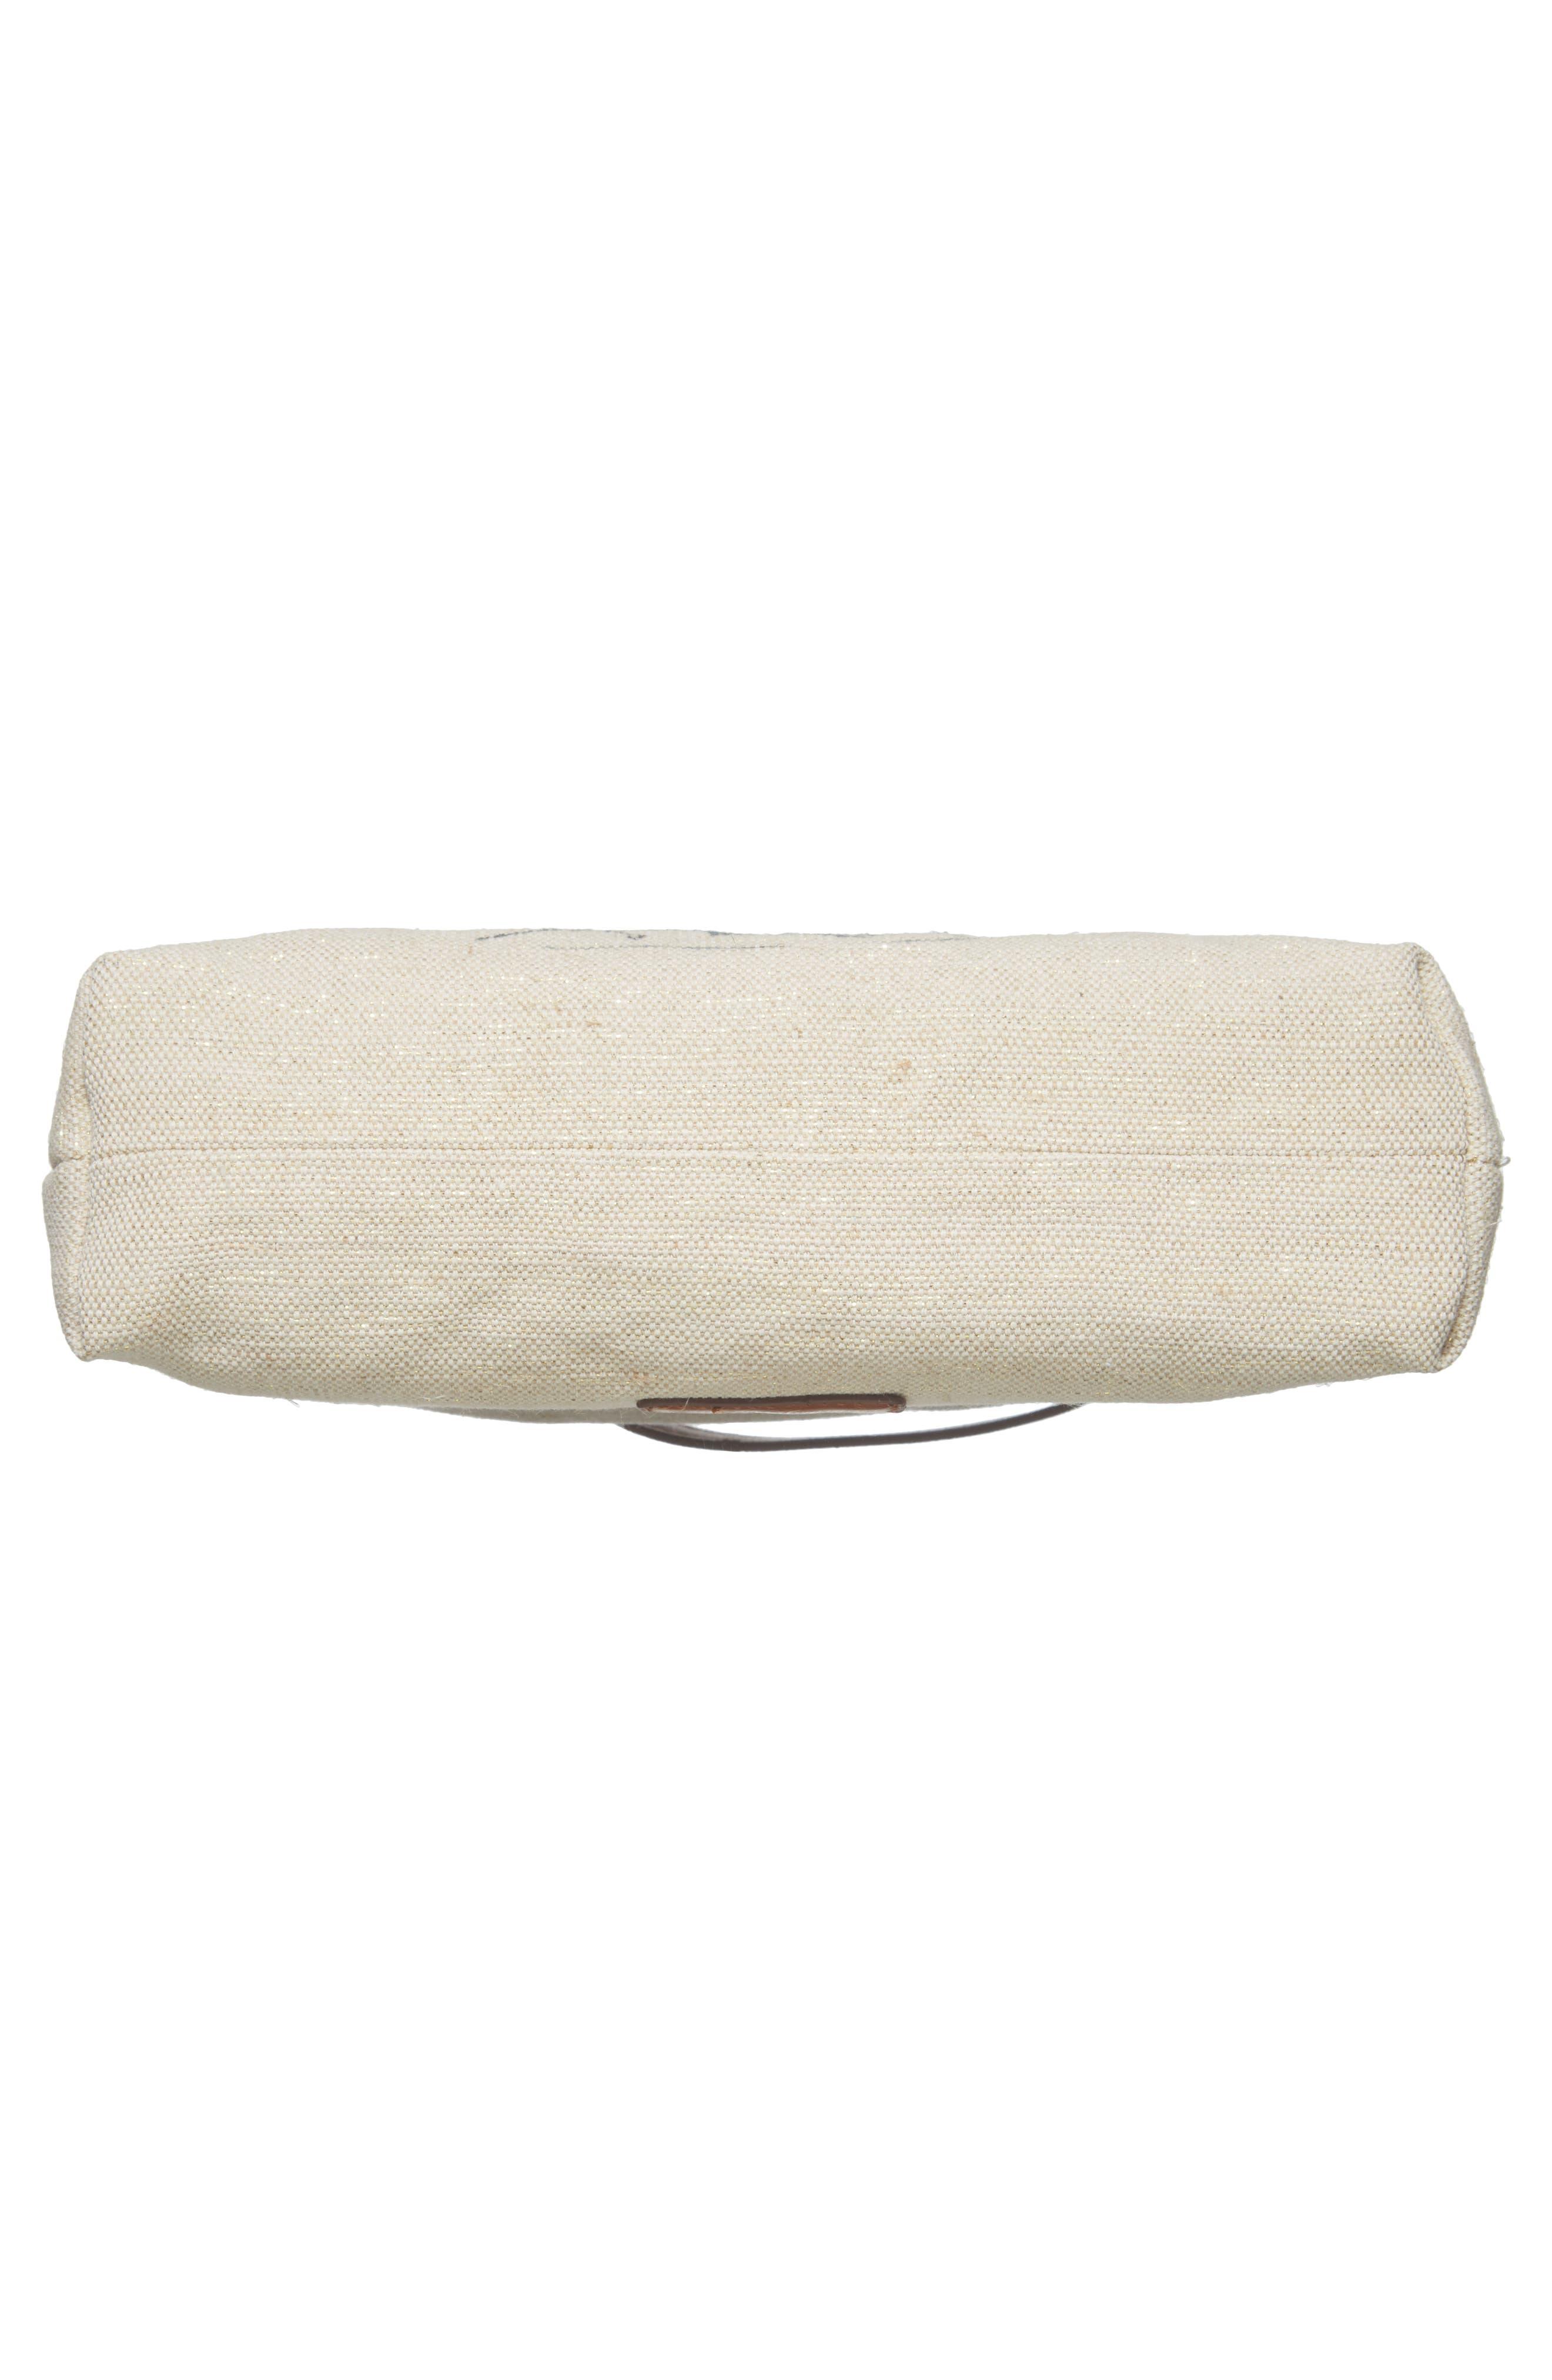 La Plancha Convertible Crossbody Bag,                             Alternate thumbnail 6, color,